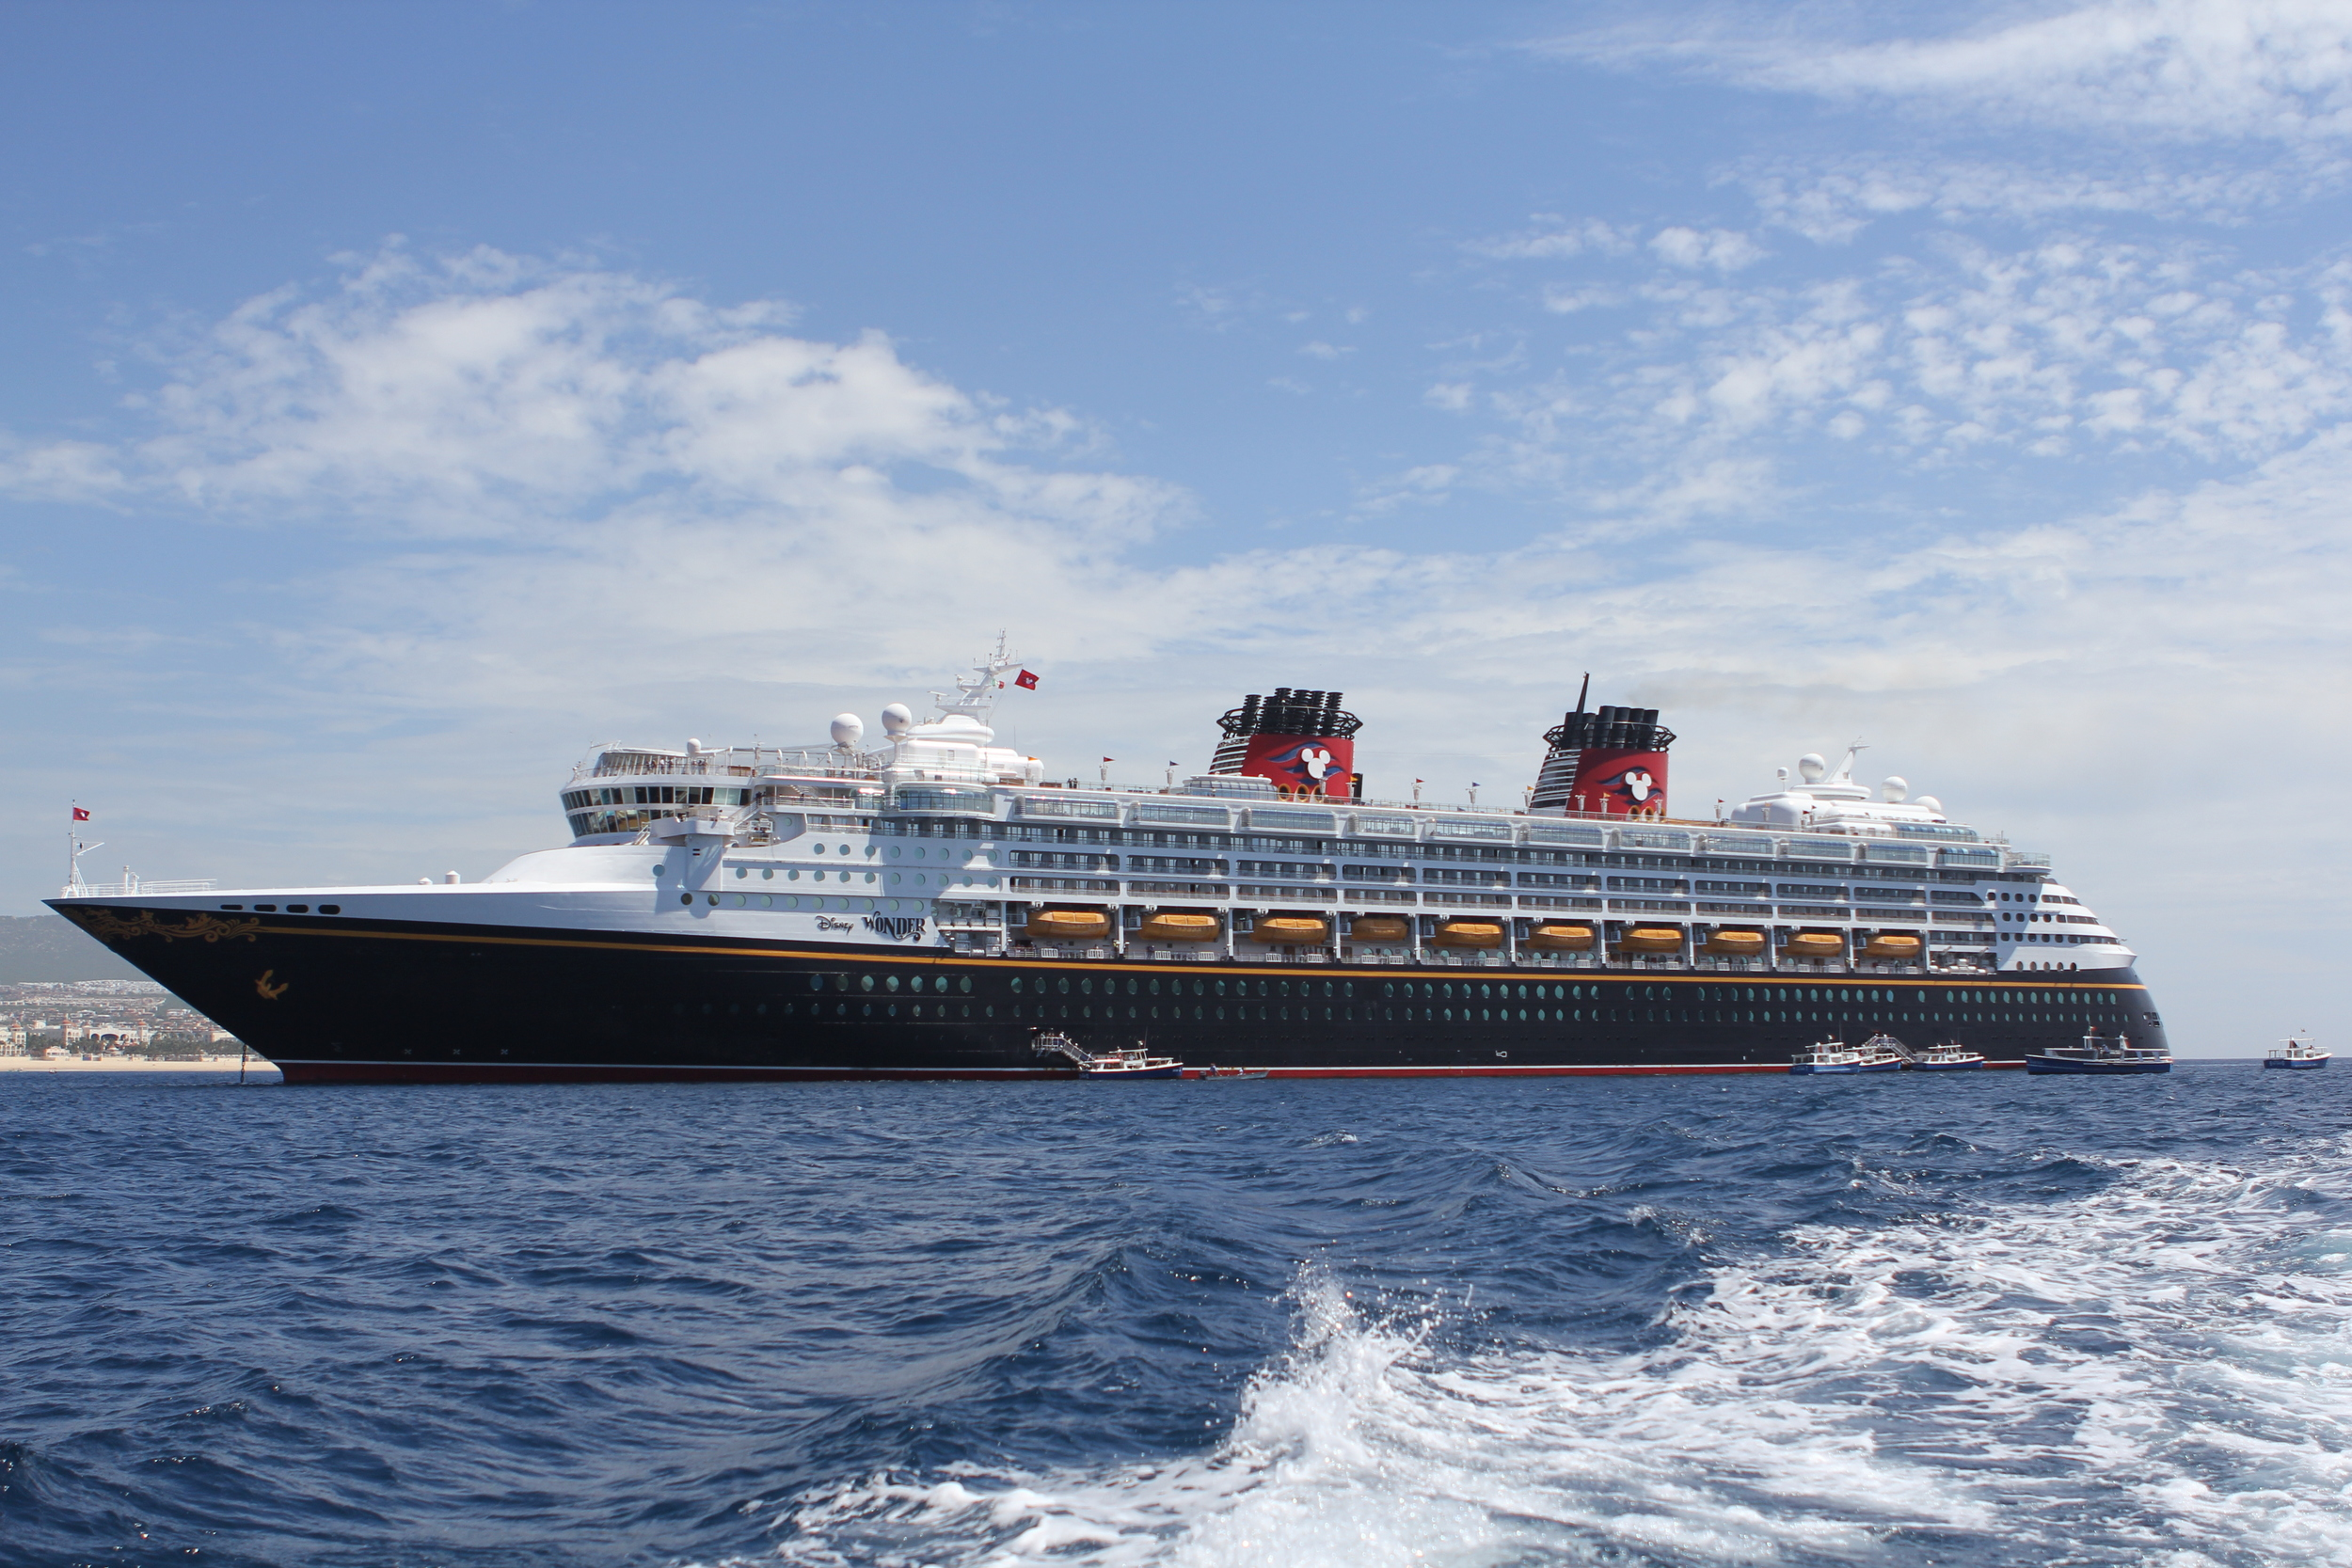 Disney Wonder, anchored in Cabo San Lucas Harbor